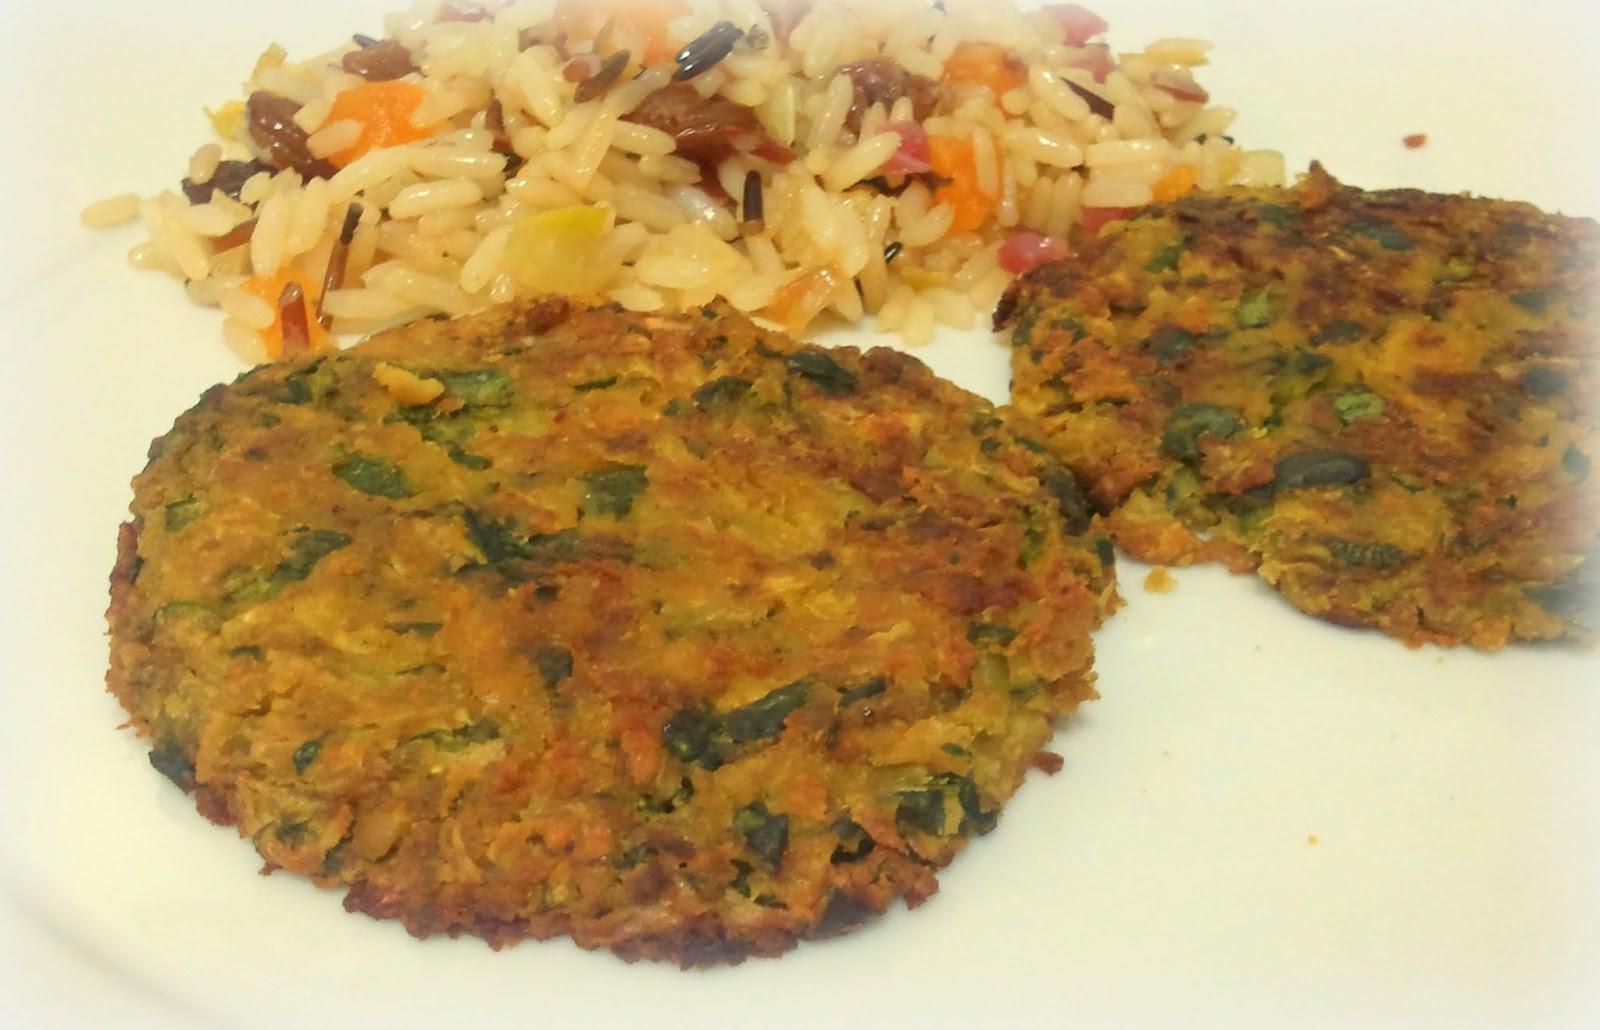 Hamburguesas vegetarianas for Cocina vegetariana facil y rapida